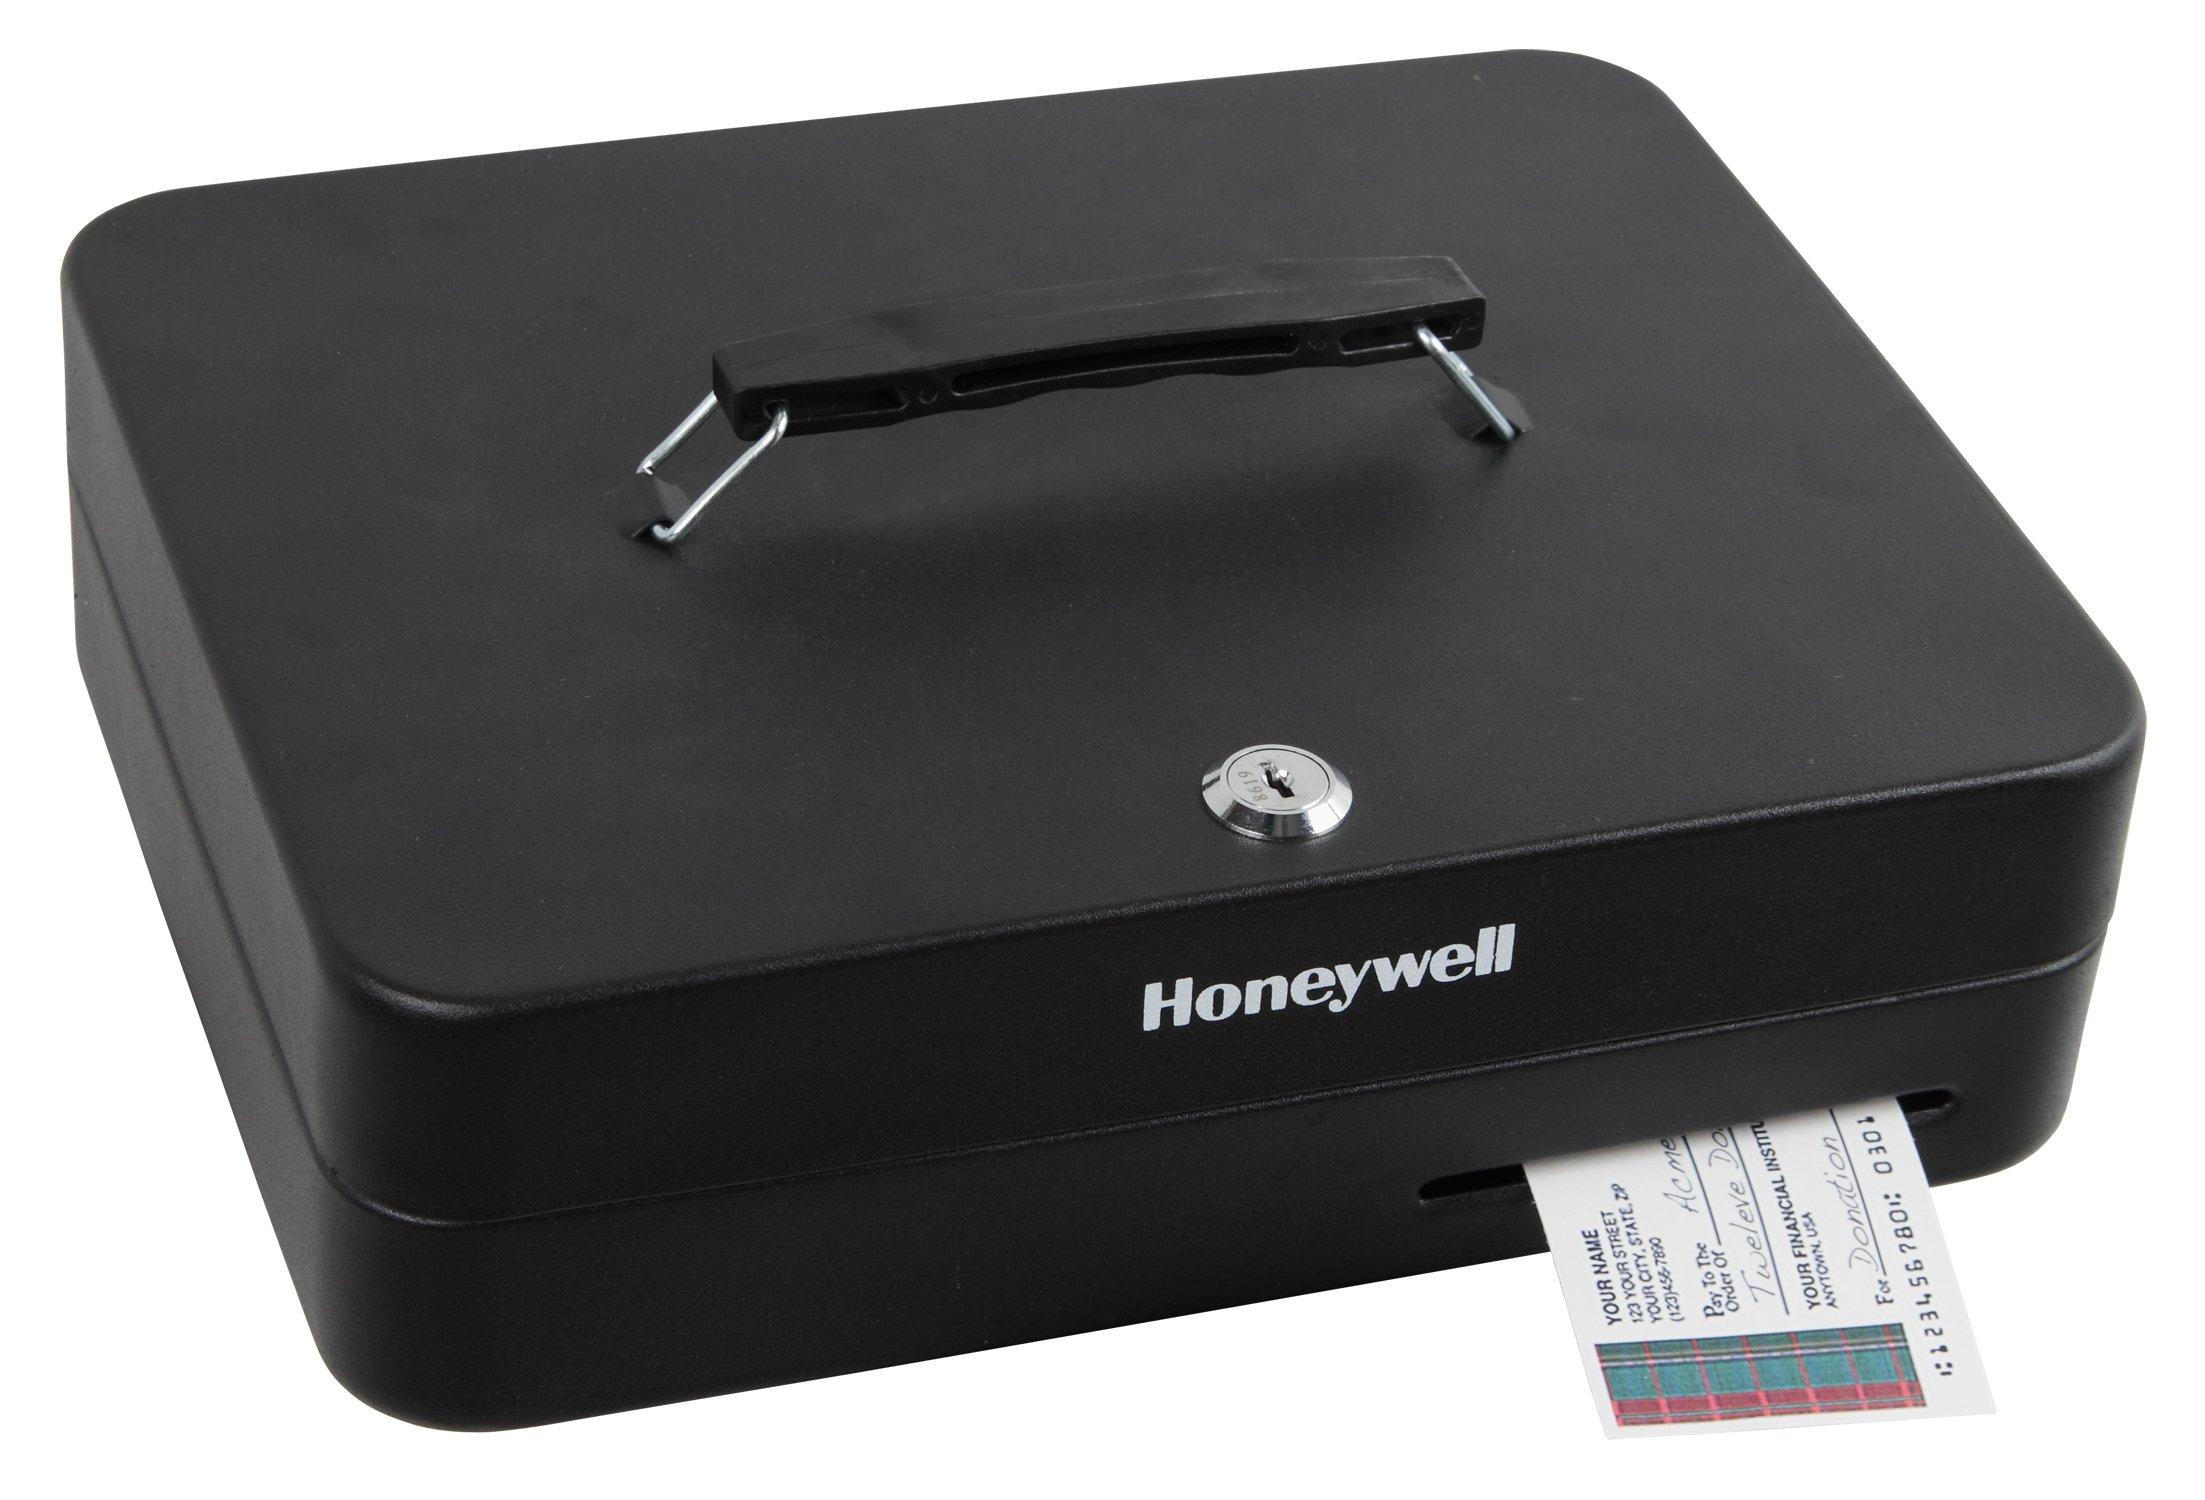 Honeywell Safes & Door Locks - 6113 Deluxe Key Lock Cash Box, 0.23-Cubic Feet, Black